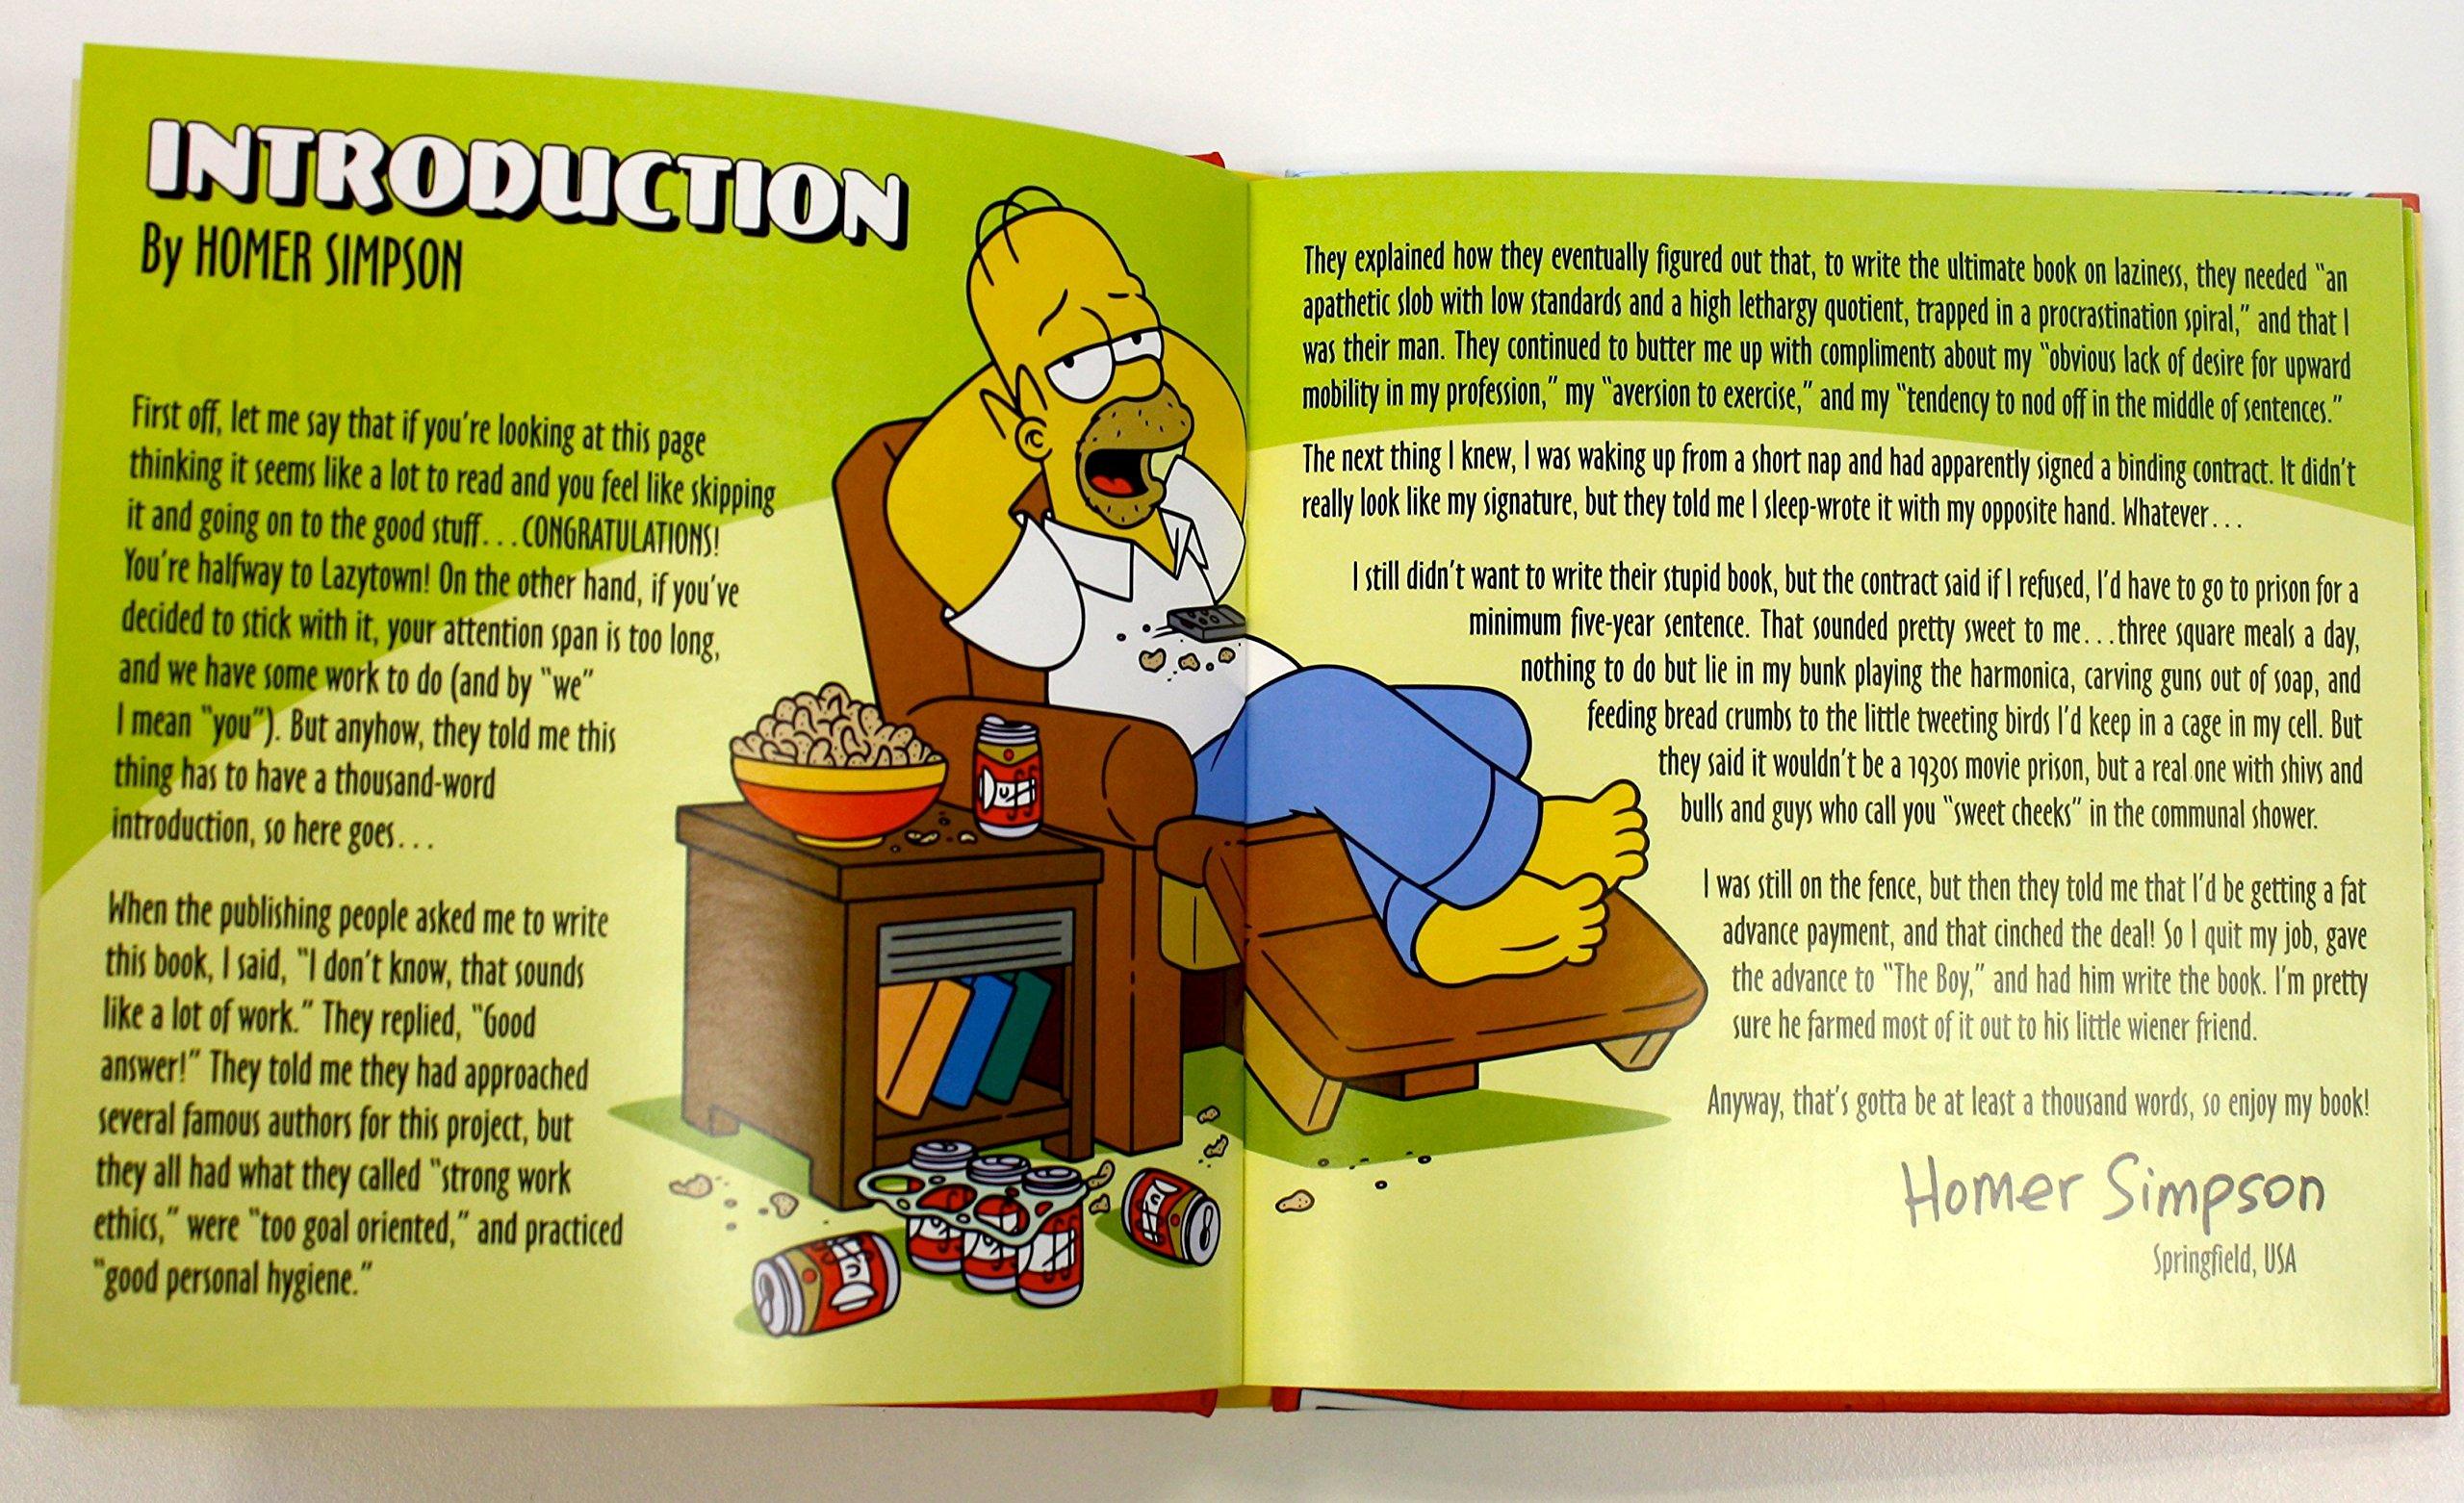 homer simpson s little book of laziness vault of simpsonology  homer simpson s little book of laziness vault of simpsonology 1 amazon co uk matt groening 9780593073001 books